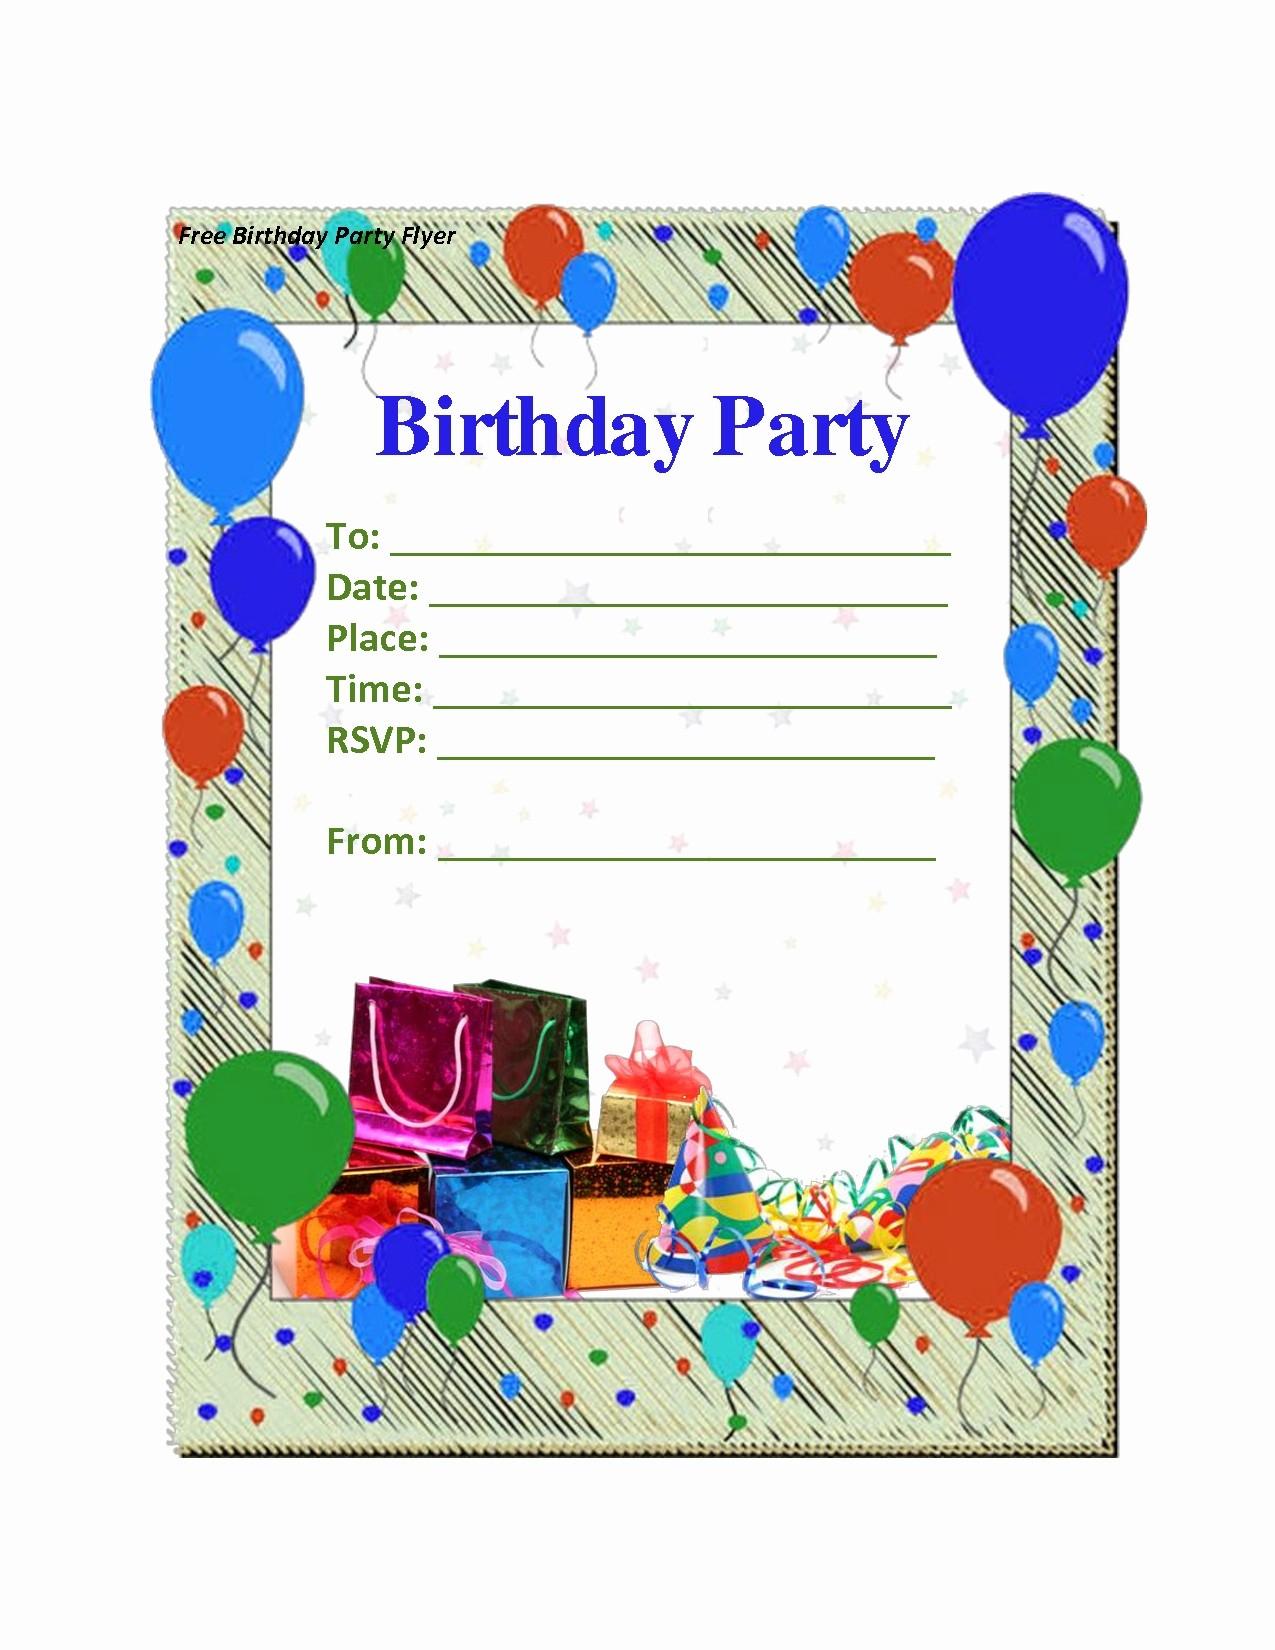 Free Printable Birthday Flyer Templates Cocktail Party Invitation - Free Printable Birthday Party Flyers